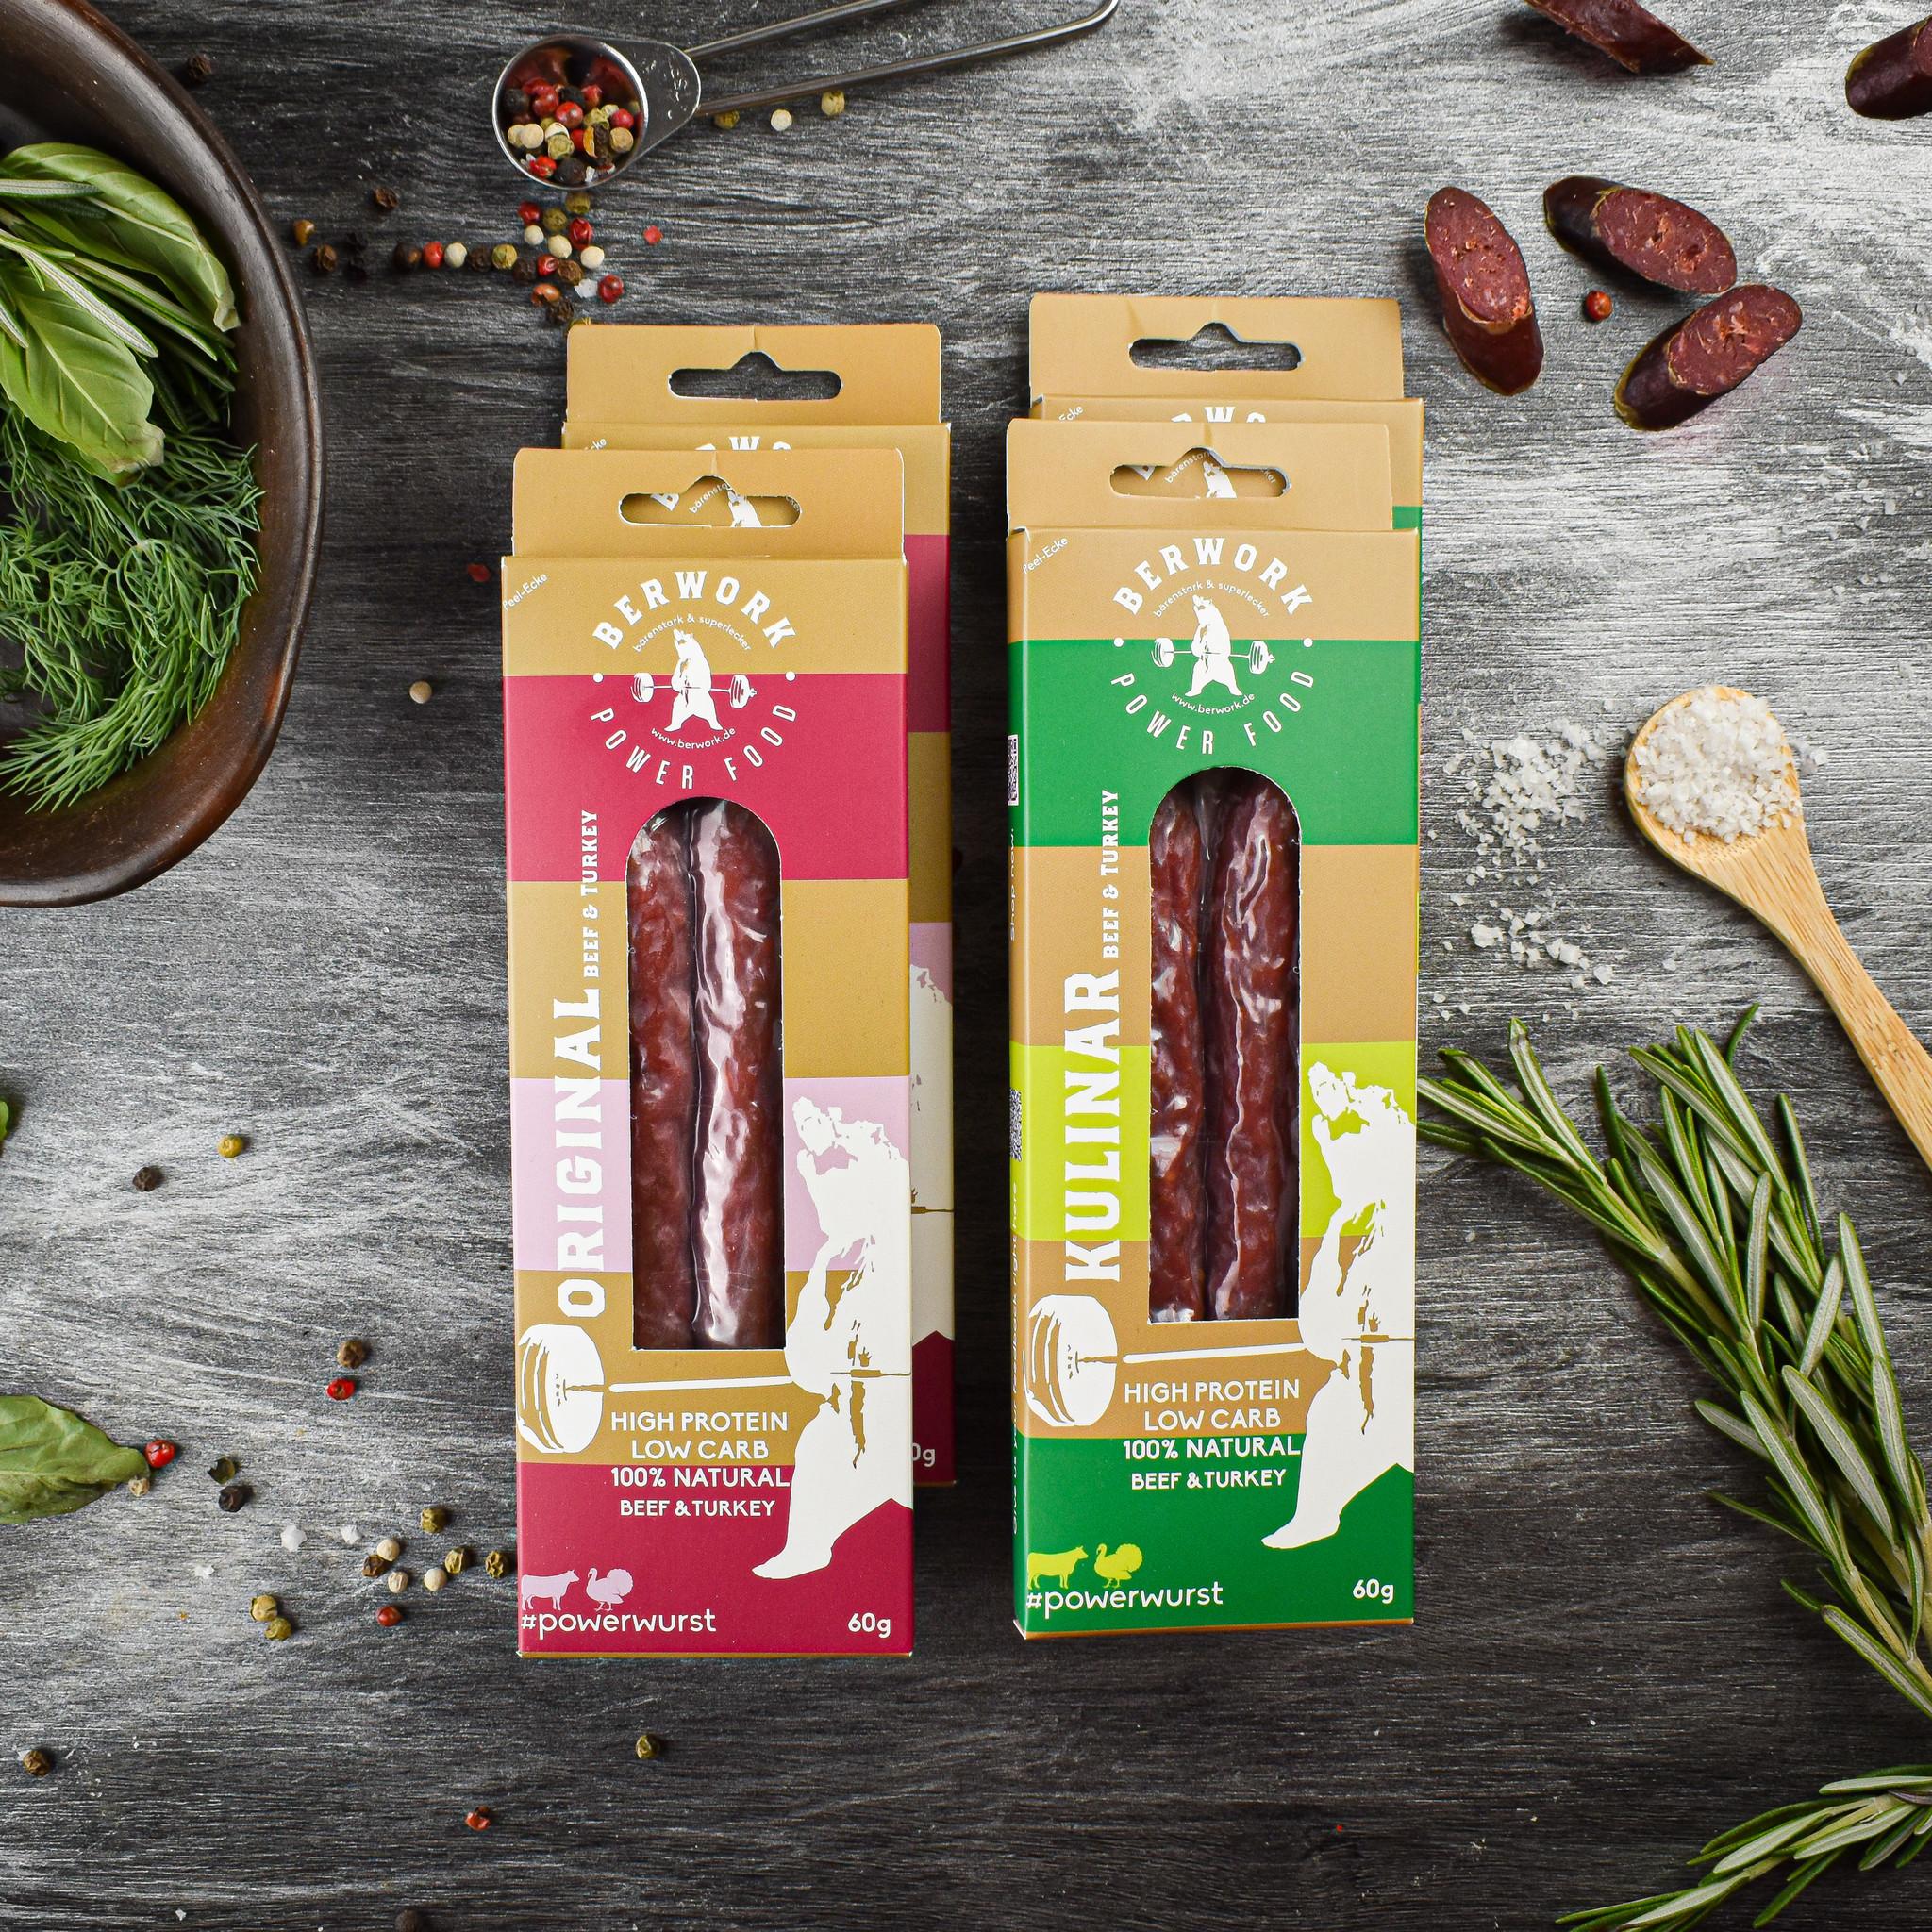 berwork Power sausage Beef-Turkey meat Trial Pack XL (240g)